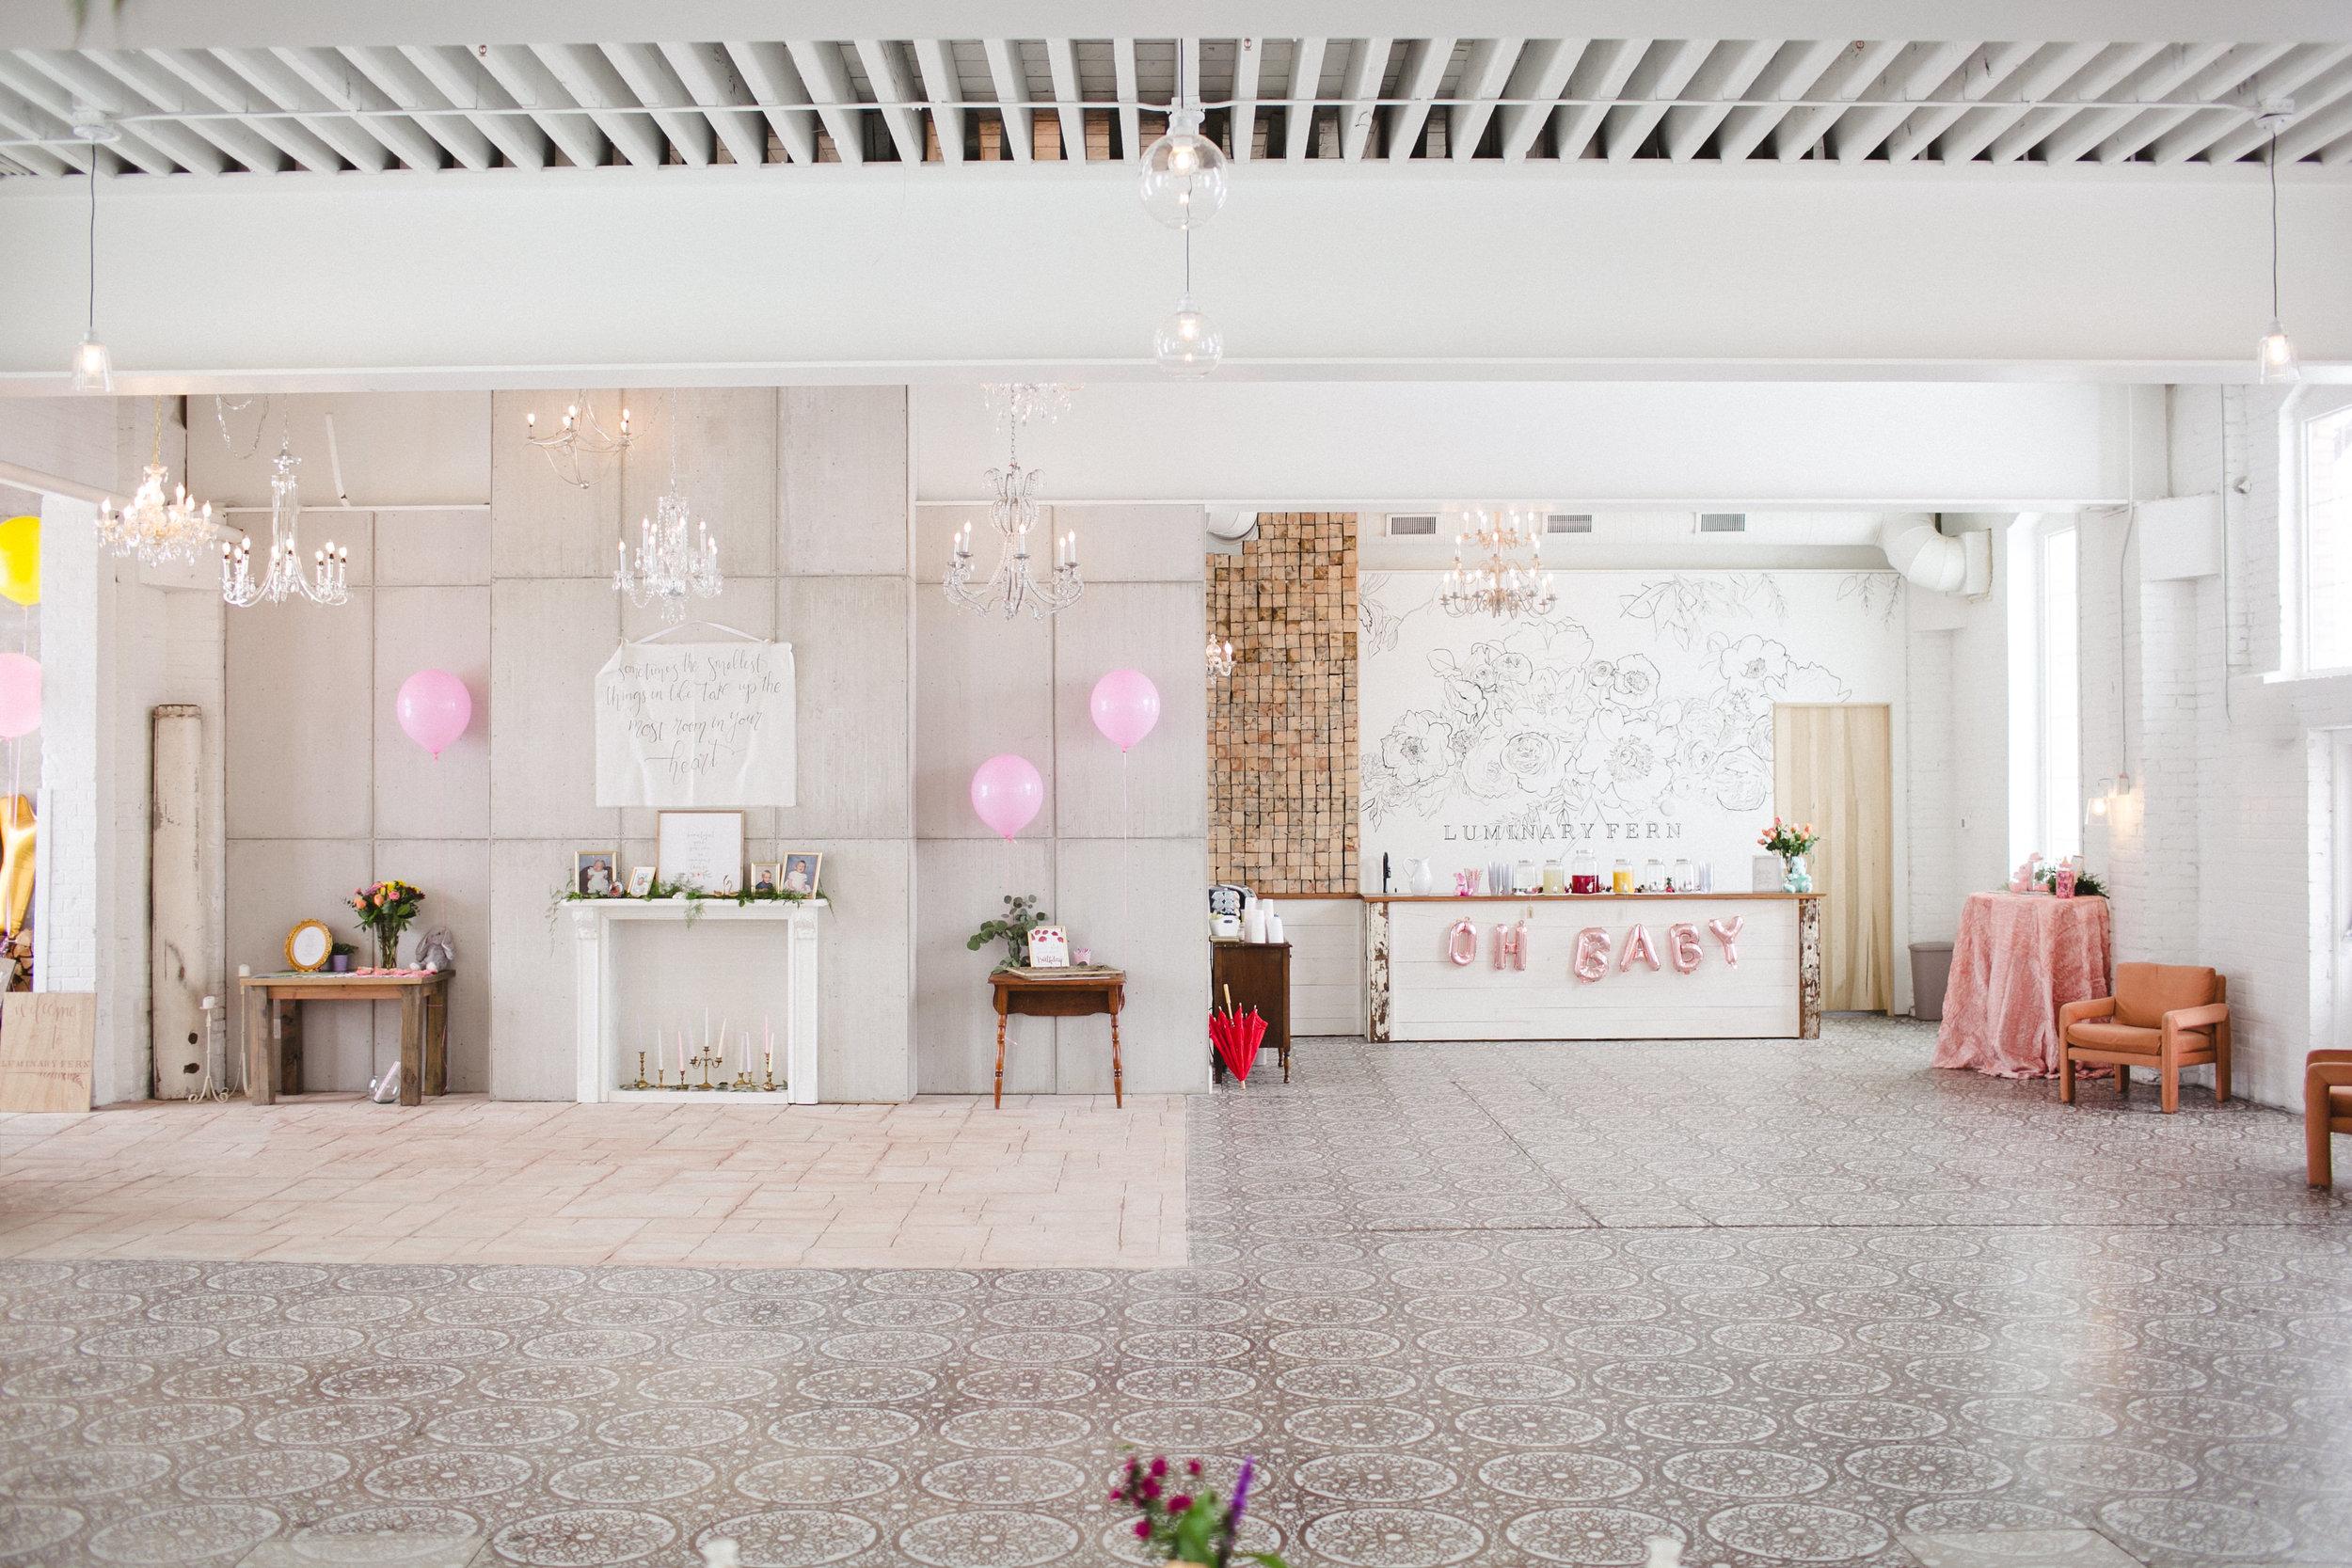 by Aimee Jobe Luminary Fern Brainerd Baby Shower Space-25.jpg